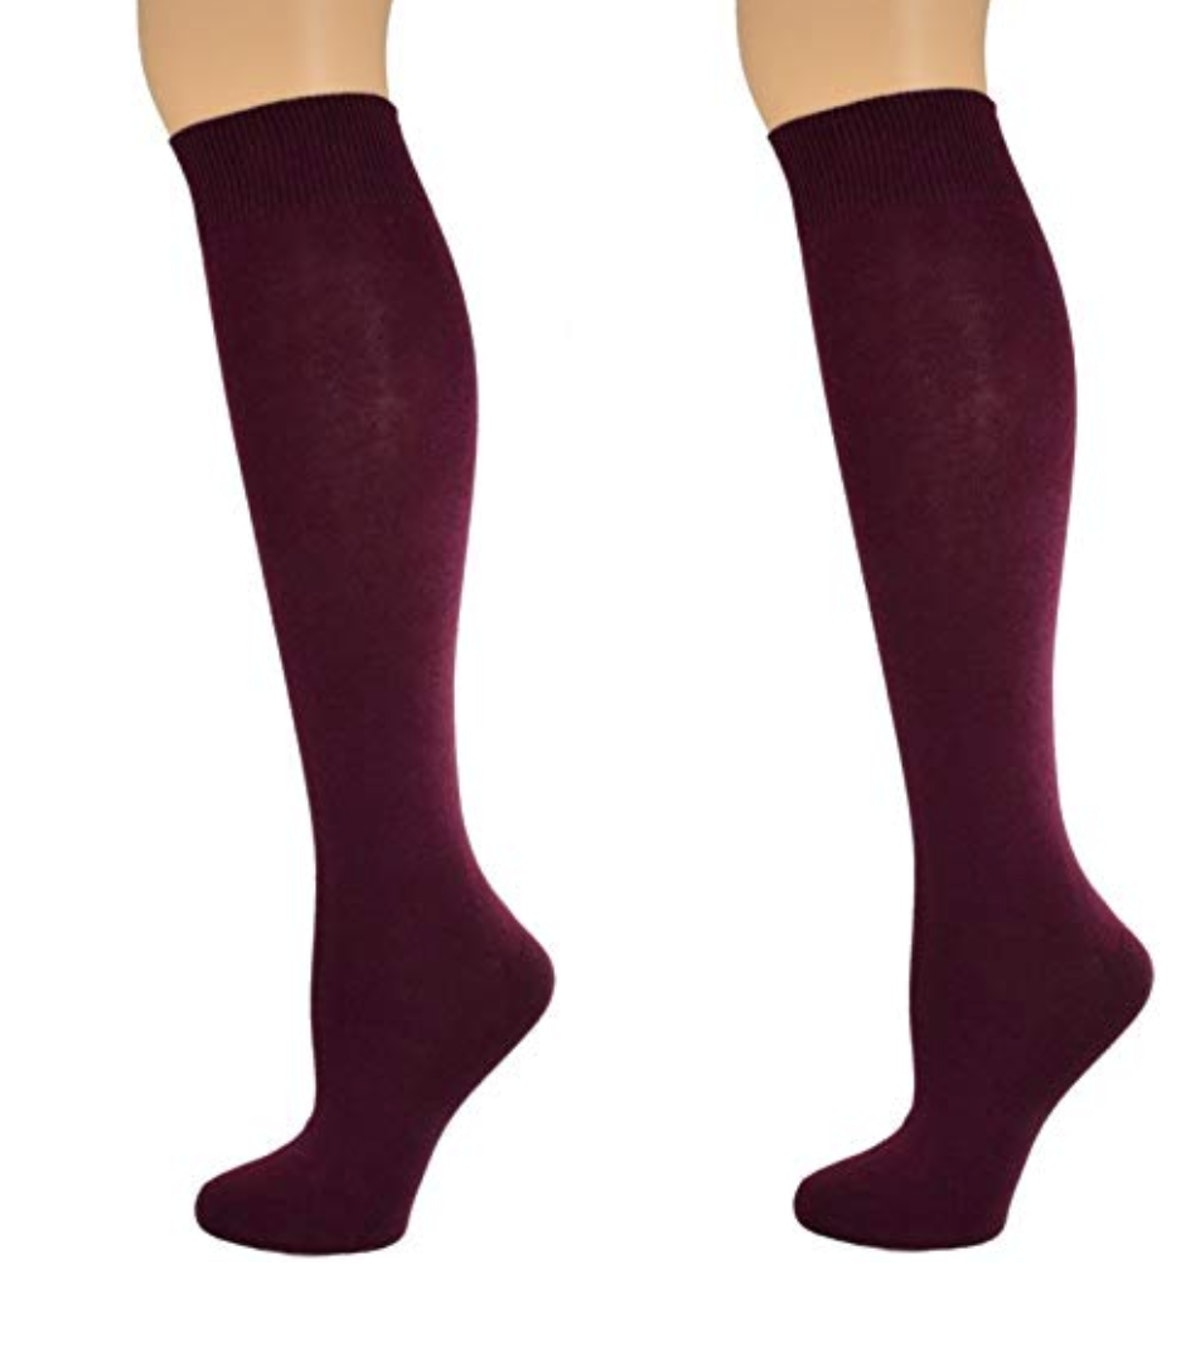 Sierra Socks Girl's School Uniform Knee High Cotton Socks